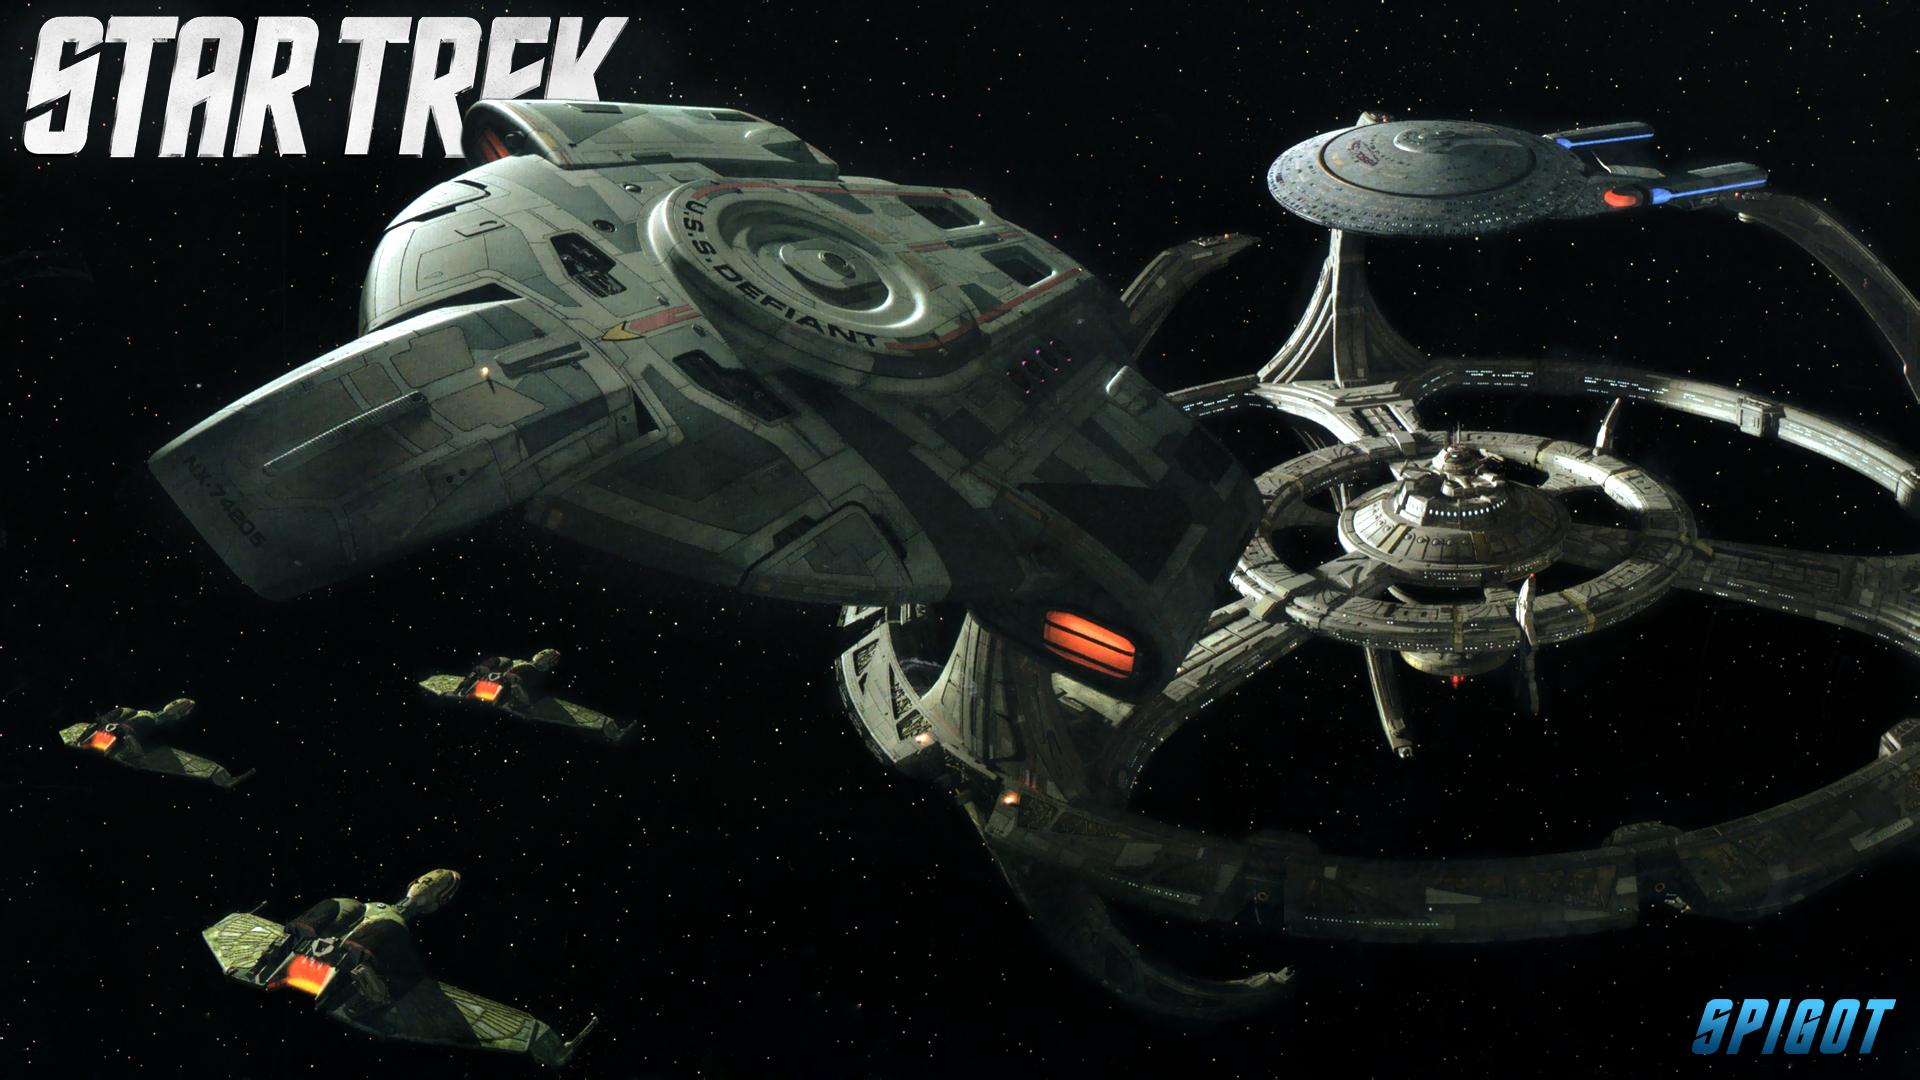 Star Trek Ships Wallpapers George Spigot S Blog